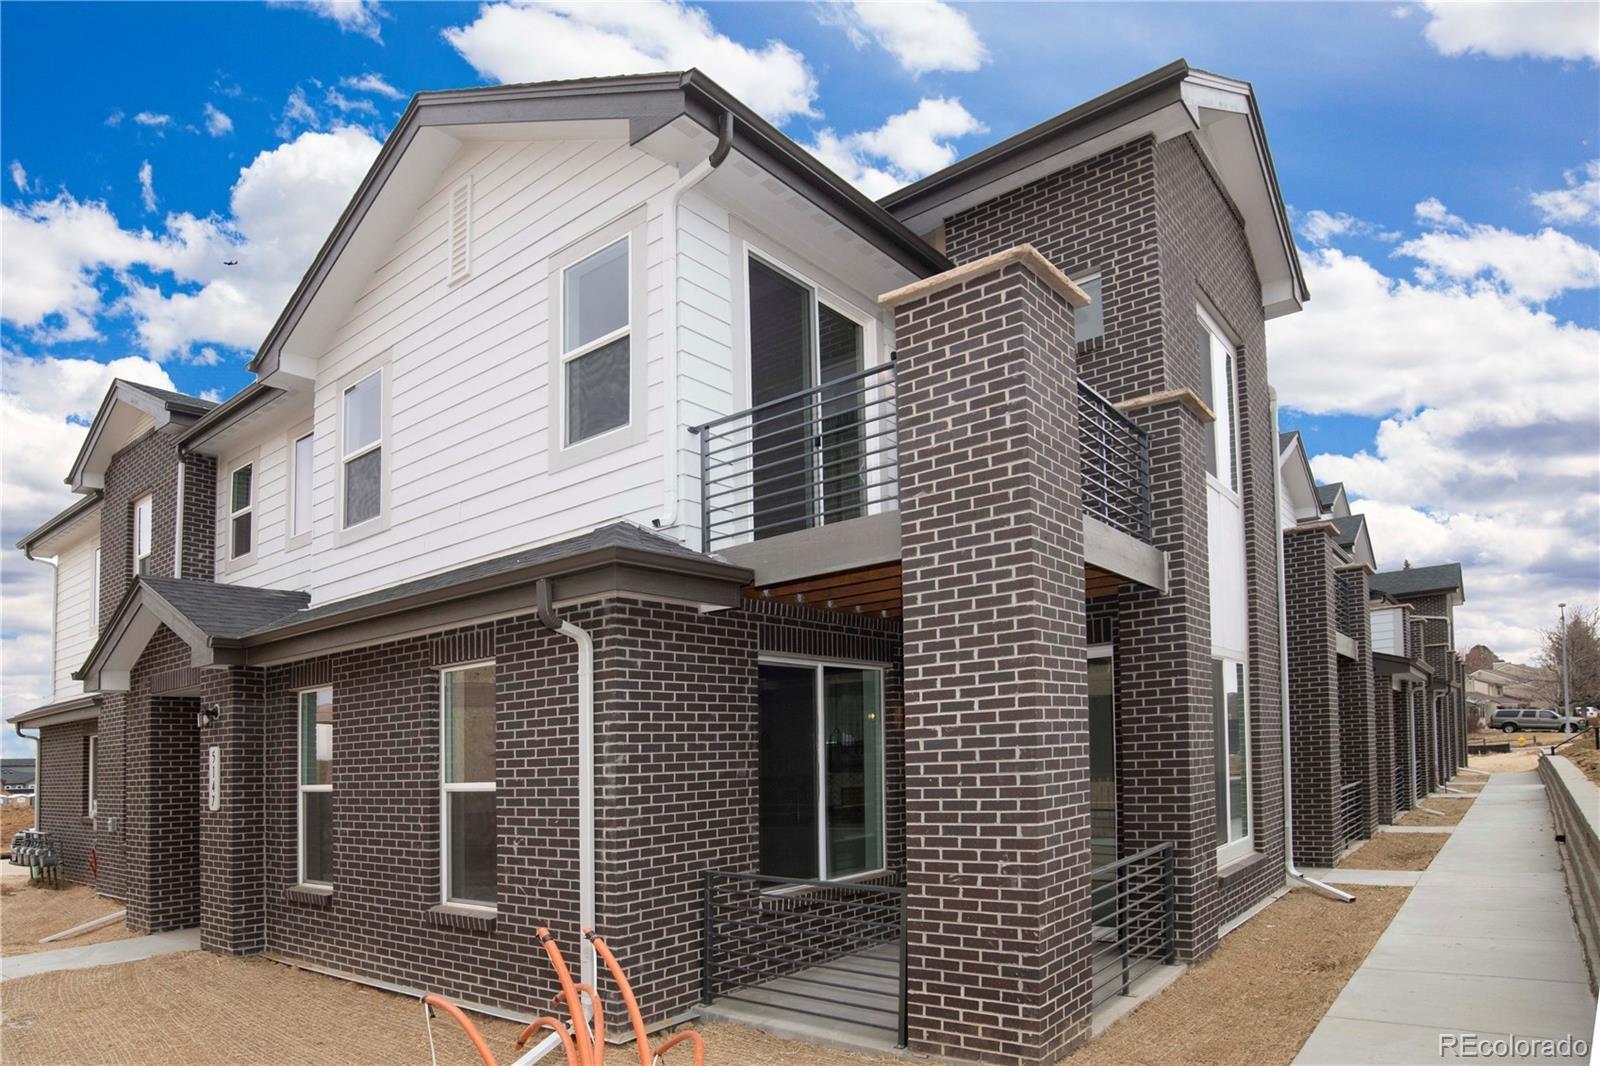 MLS# 8232116 - 1 - 5147 S Fairplay Street #38, Aurora, CO 80015